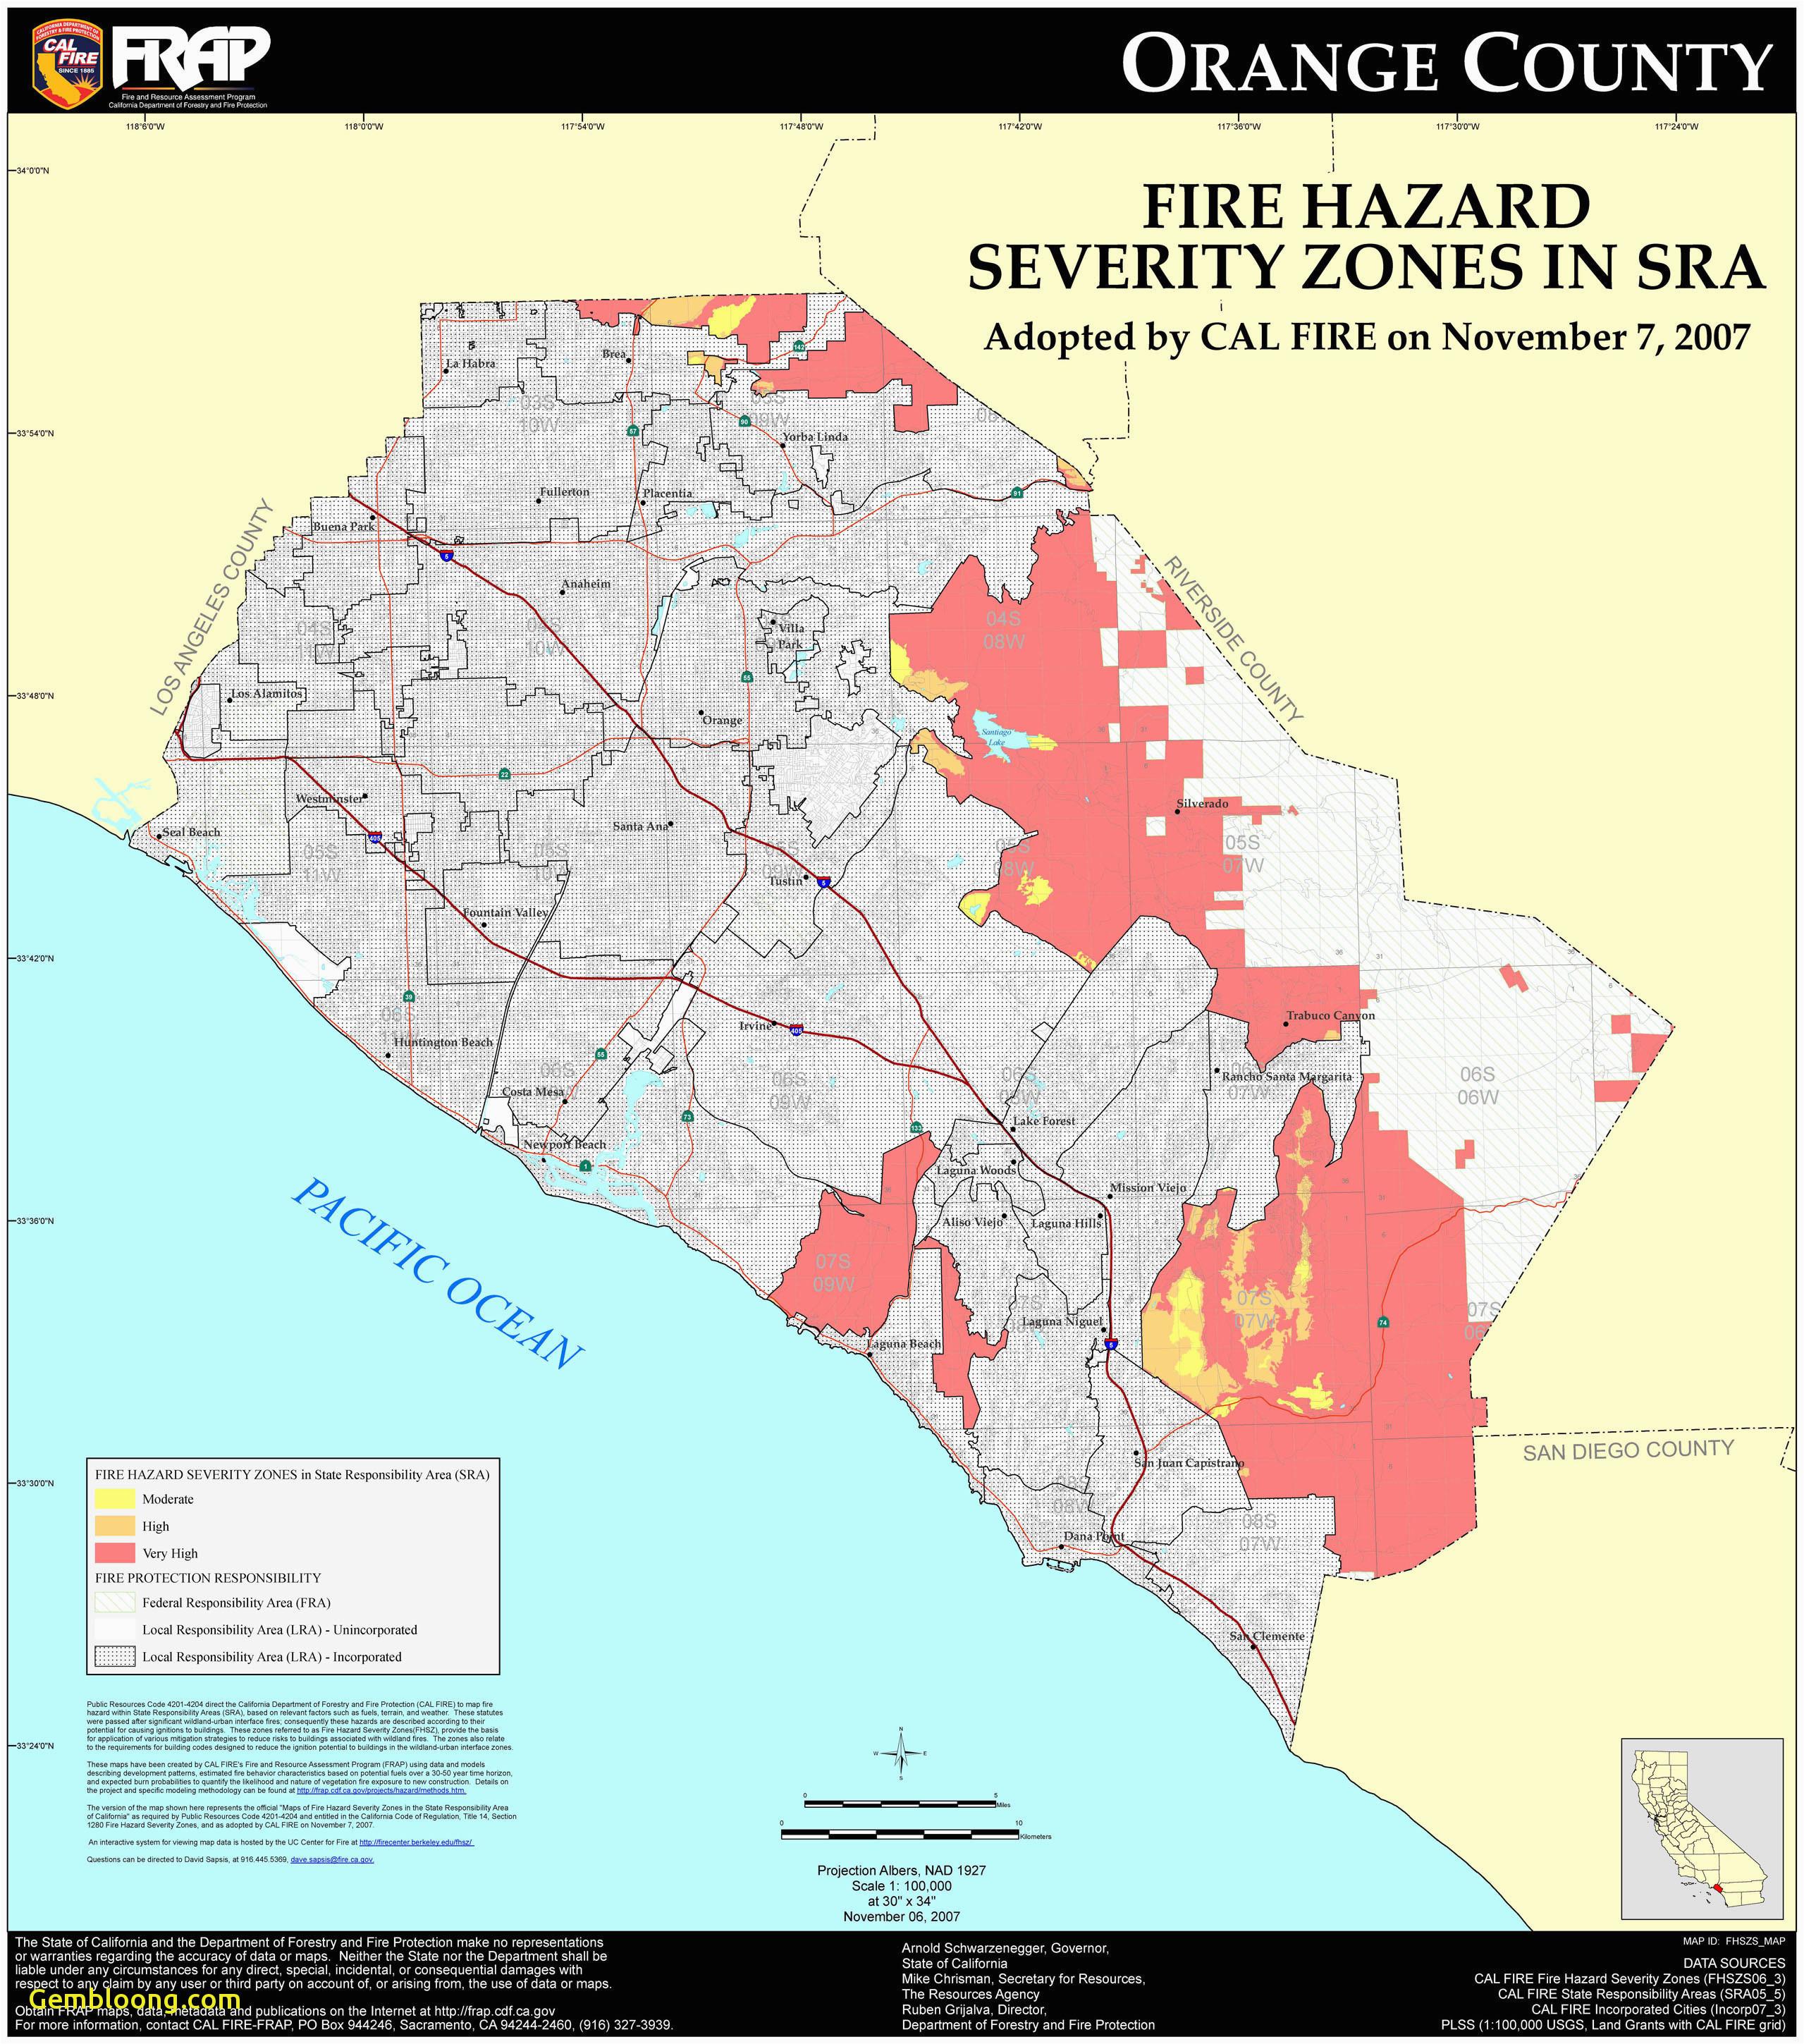 Fresno California Zip Code Map   secretmuseum on fresno freeway map, fresno airport, fresno district map, clovis community center map, fresno zip code list, area code and time zone map, fresno ca zip code, chino hills zip codes map, fresno county map, fresno zip codes by street, clovis community college map, american union elementary fresno ca map, san francisco ca zip codes map, fresno zip code boundaries, fresno state zip code, zip codes county map, fresno elevation map, fresno area map, fresno neighborhood map,